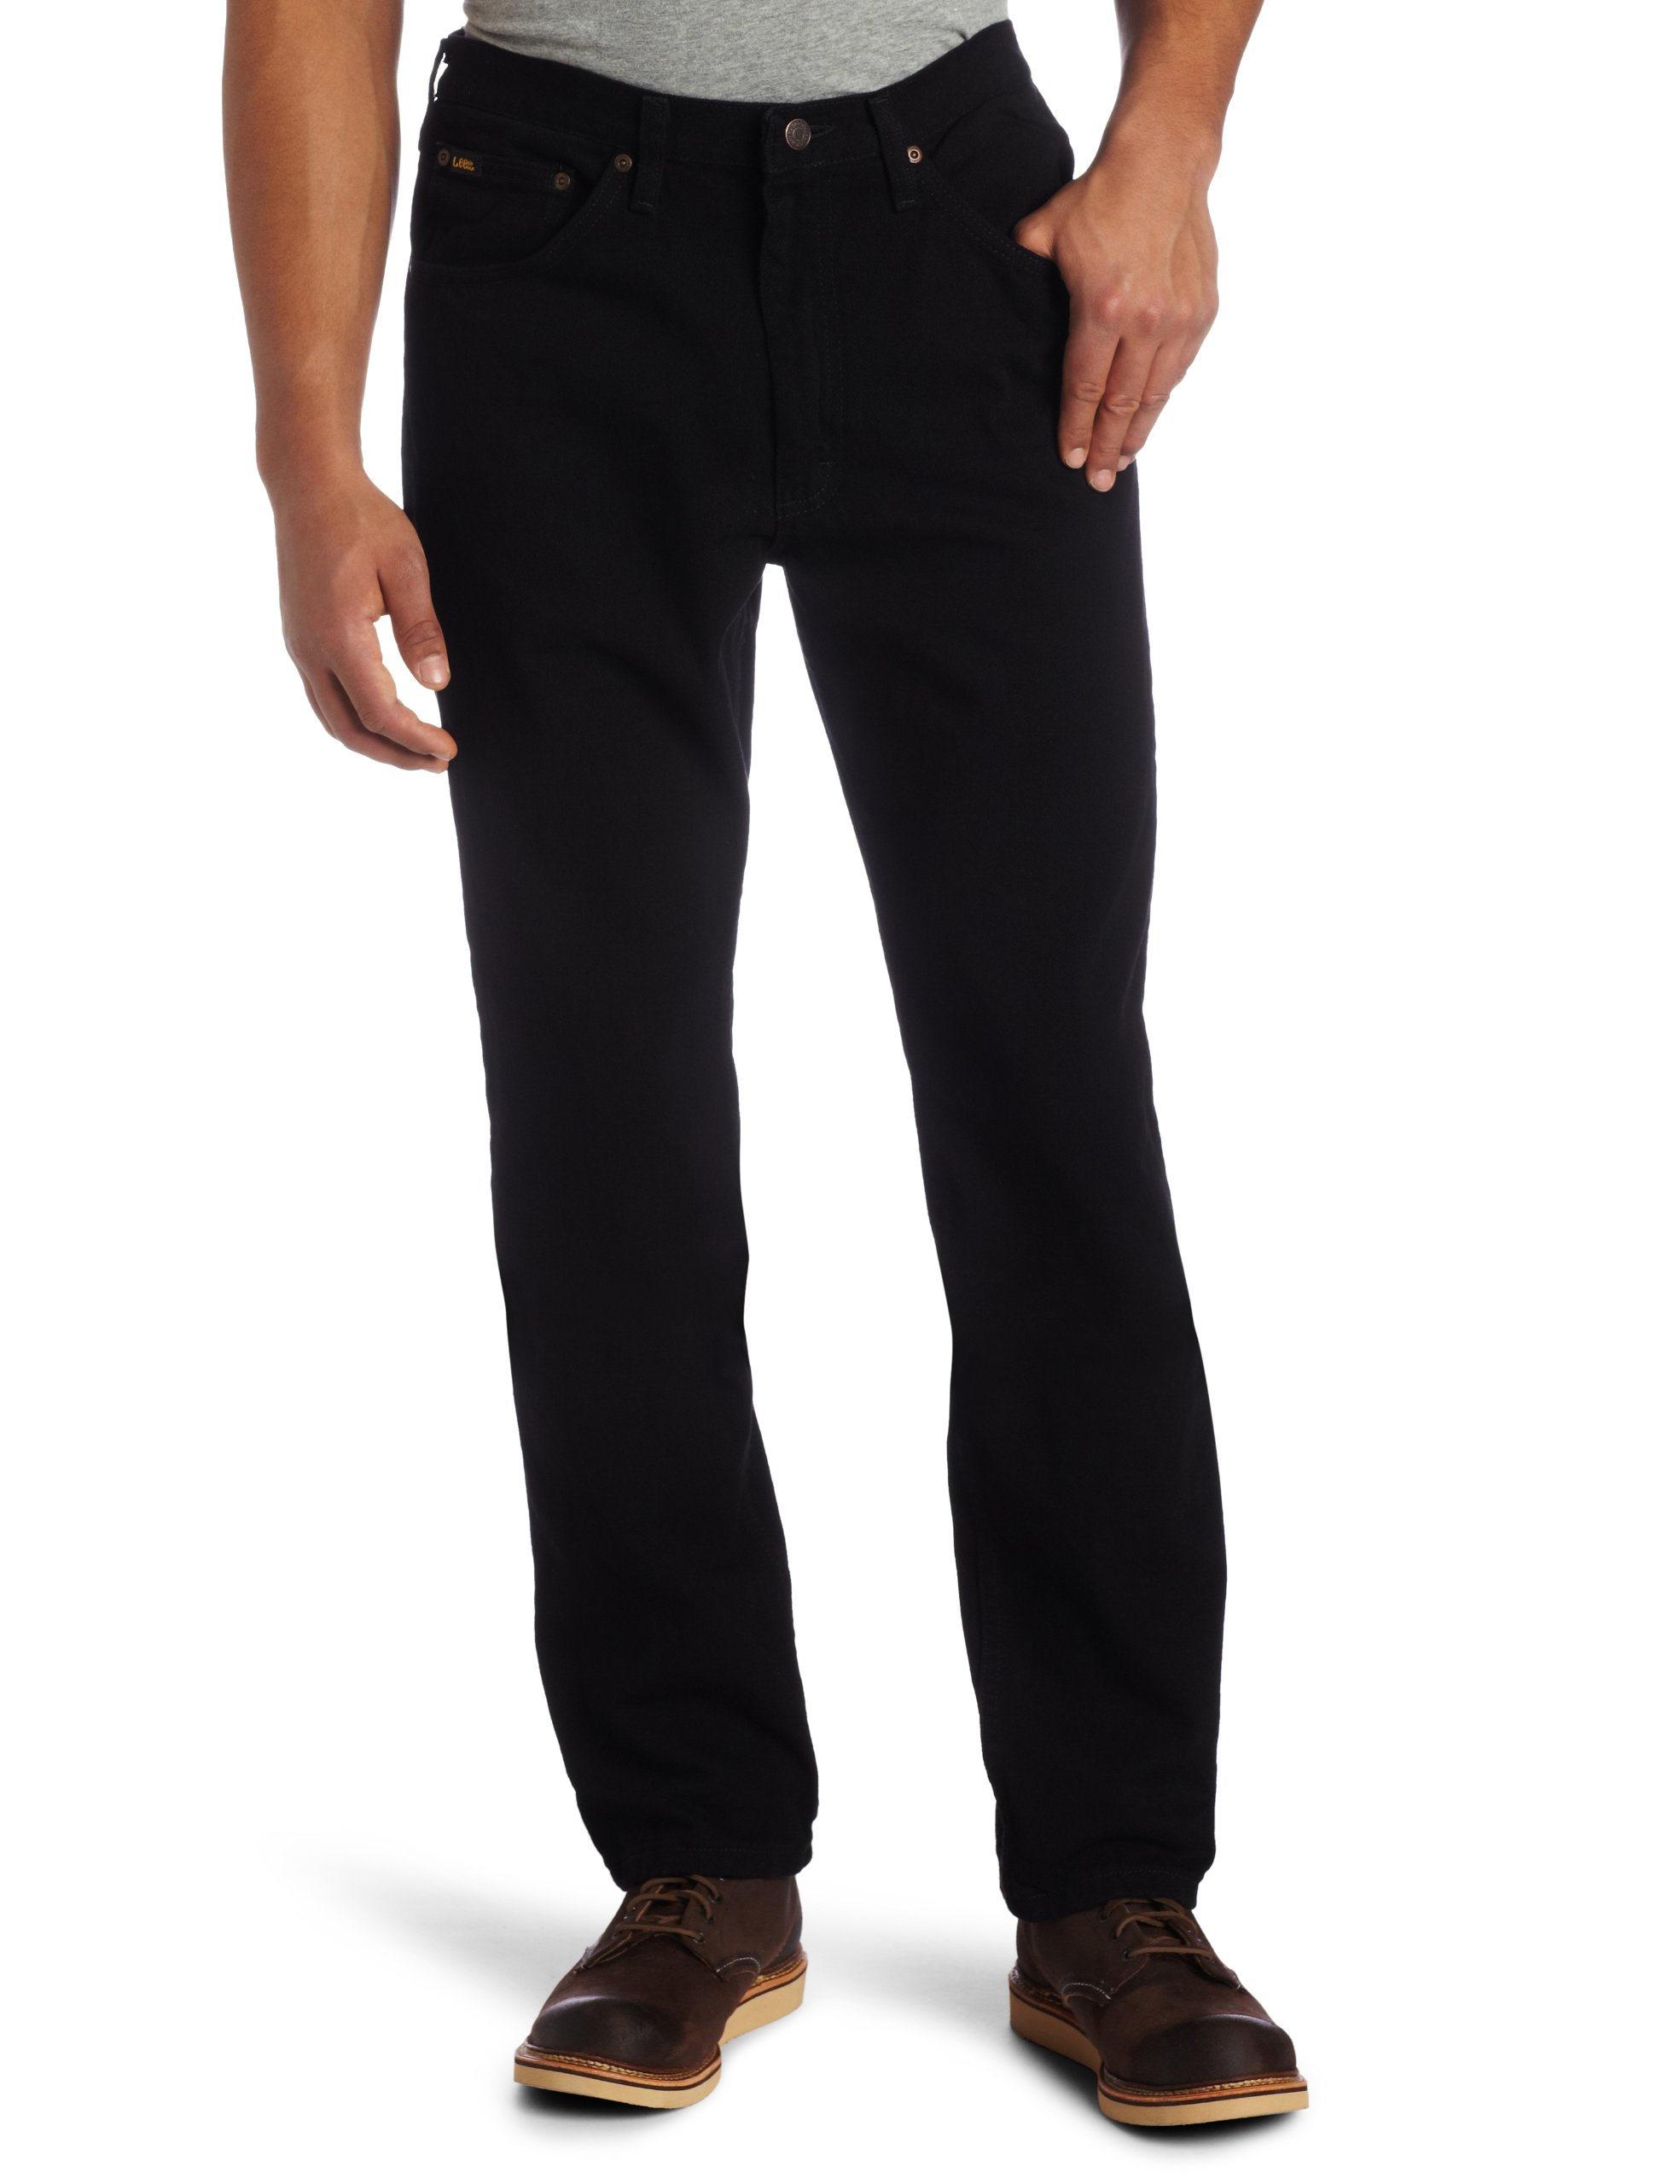 Lee Men's Regular Fit Straight Leg Jean, Double Black, 33W x 32L